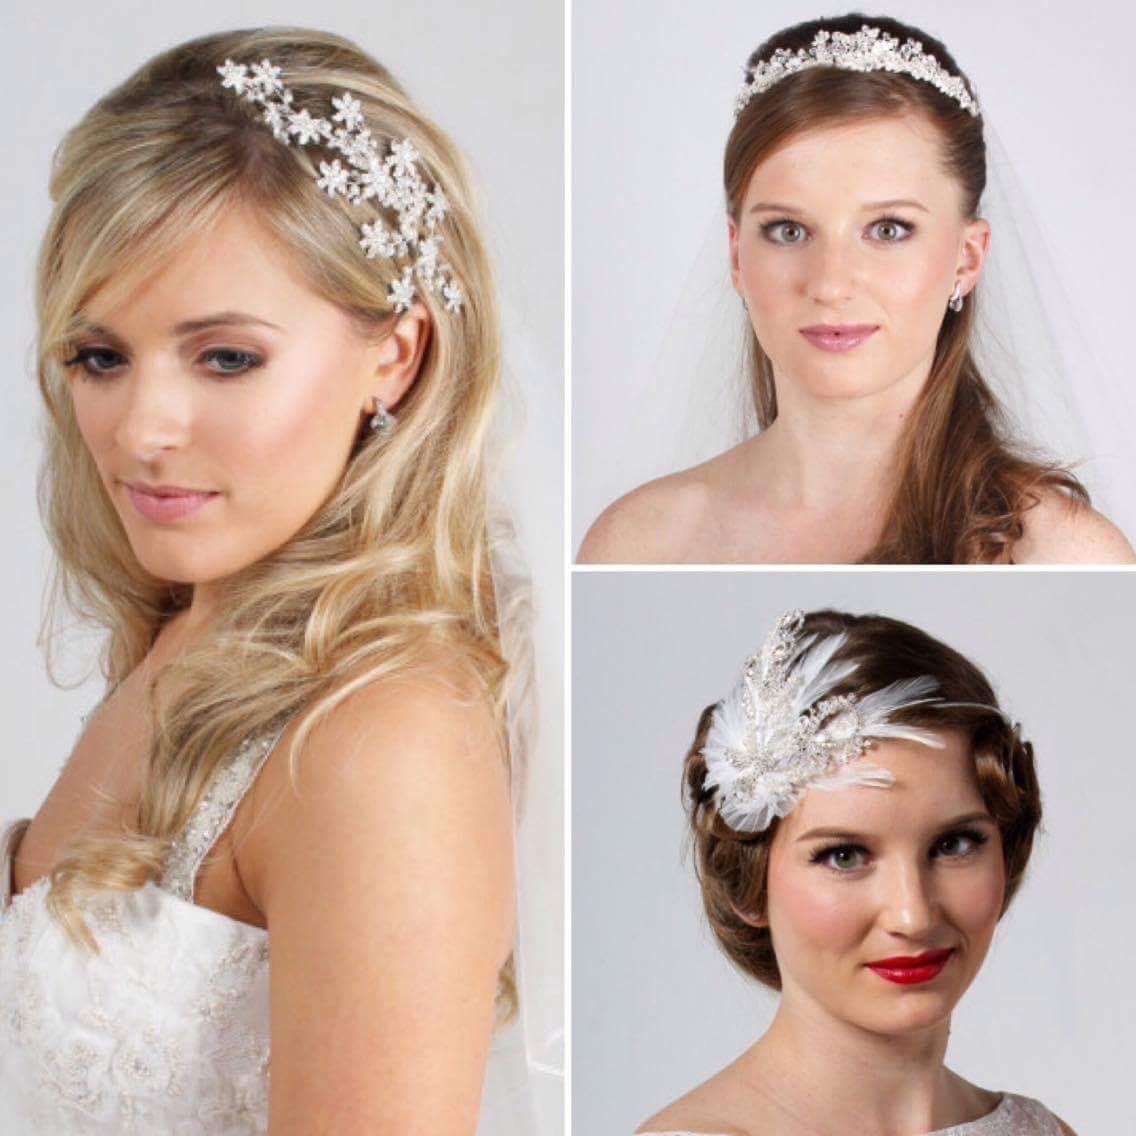 Exquisite bridal hair accessories in store sc bridal boutique